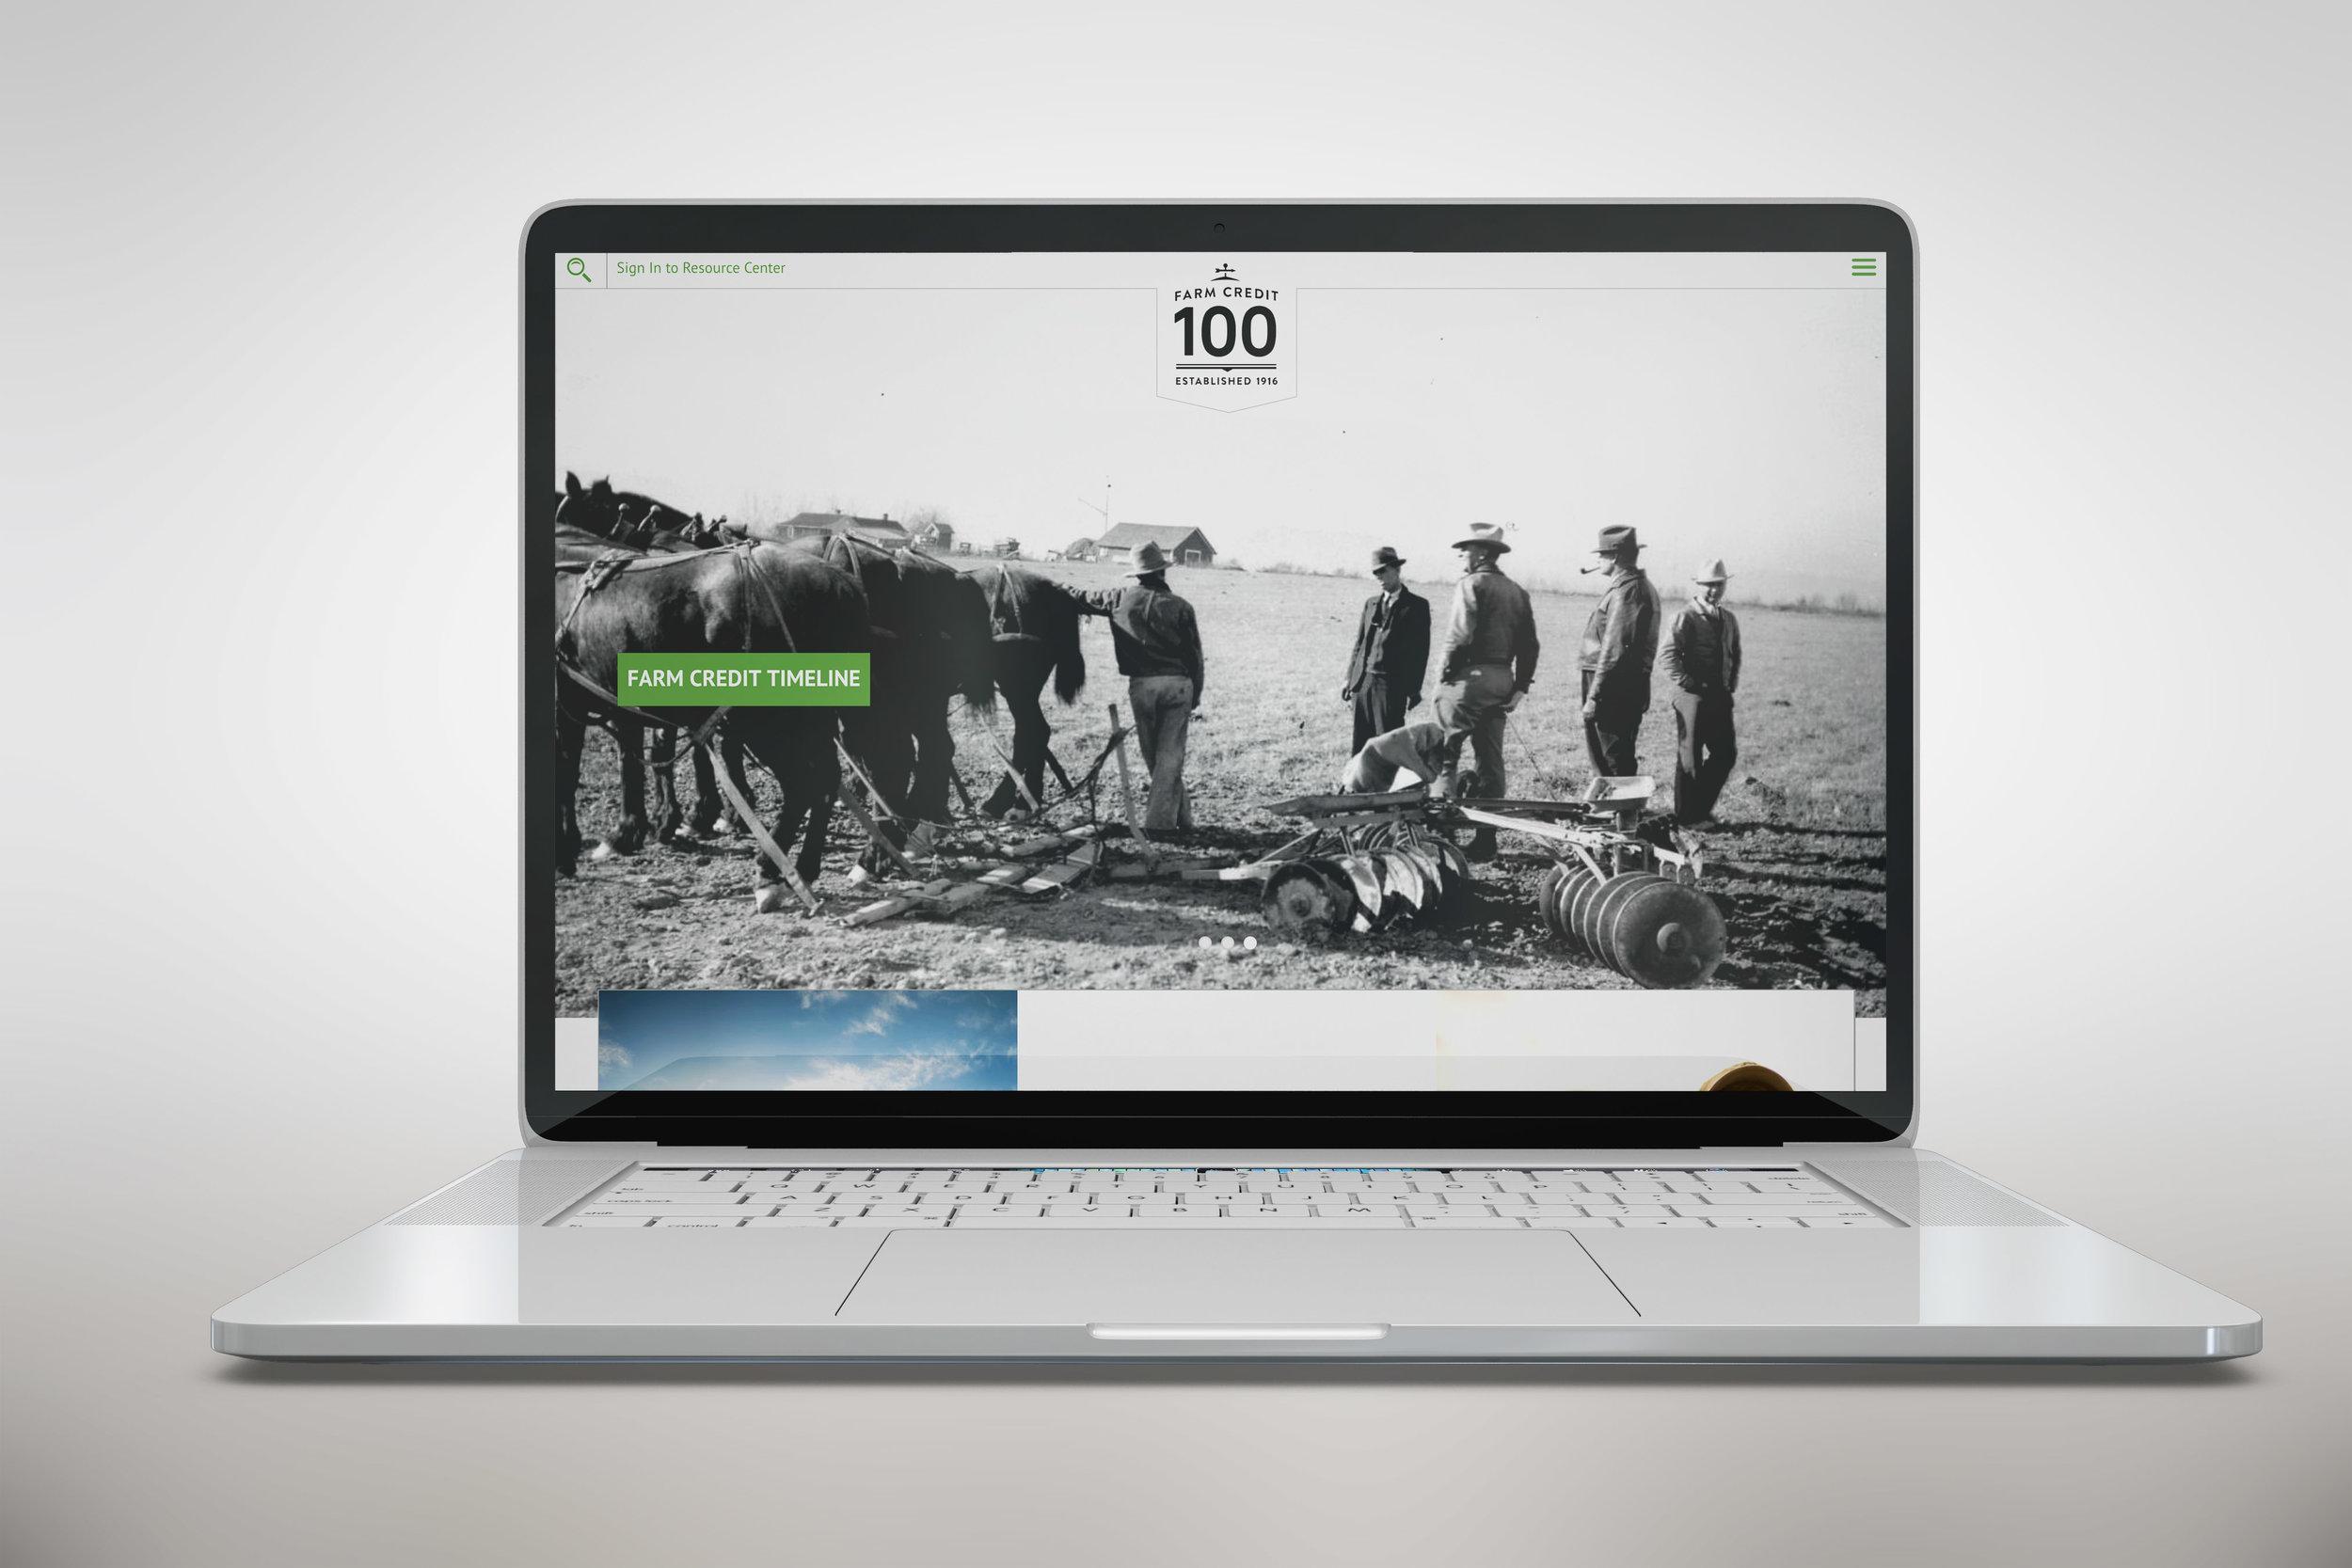 plain_laptop.jpg